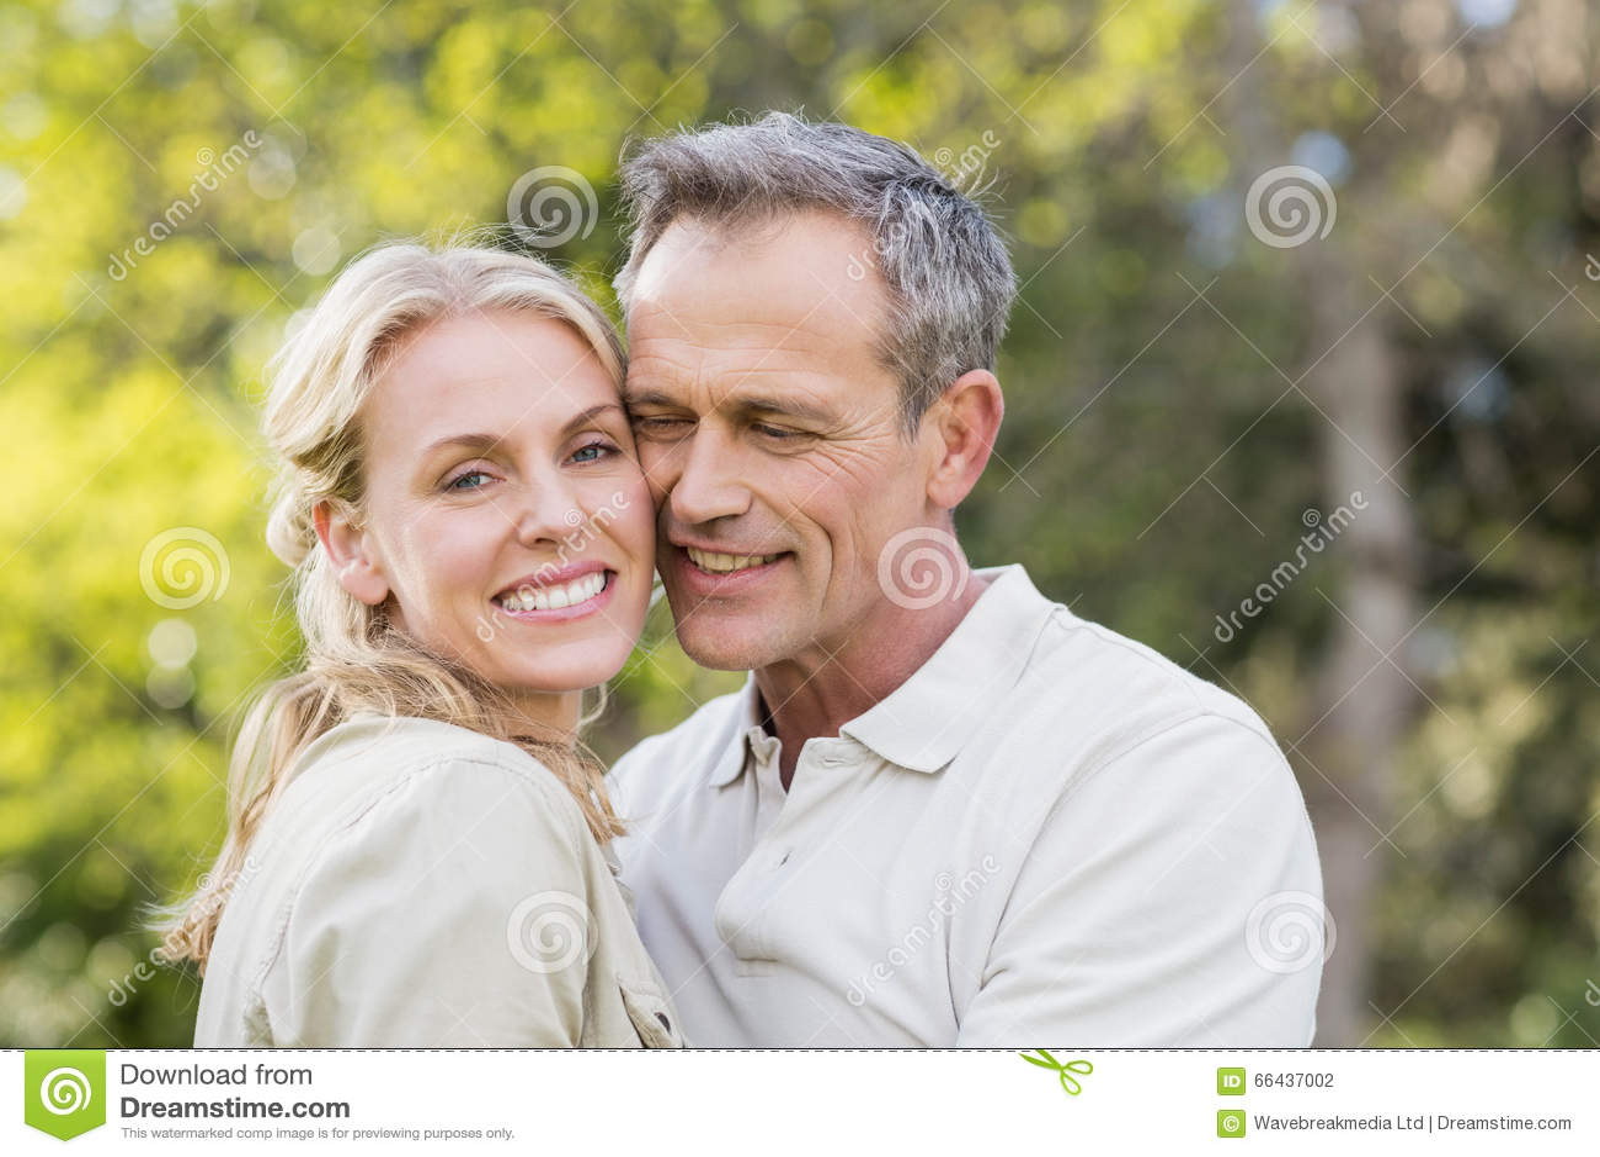 german single woman